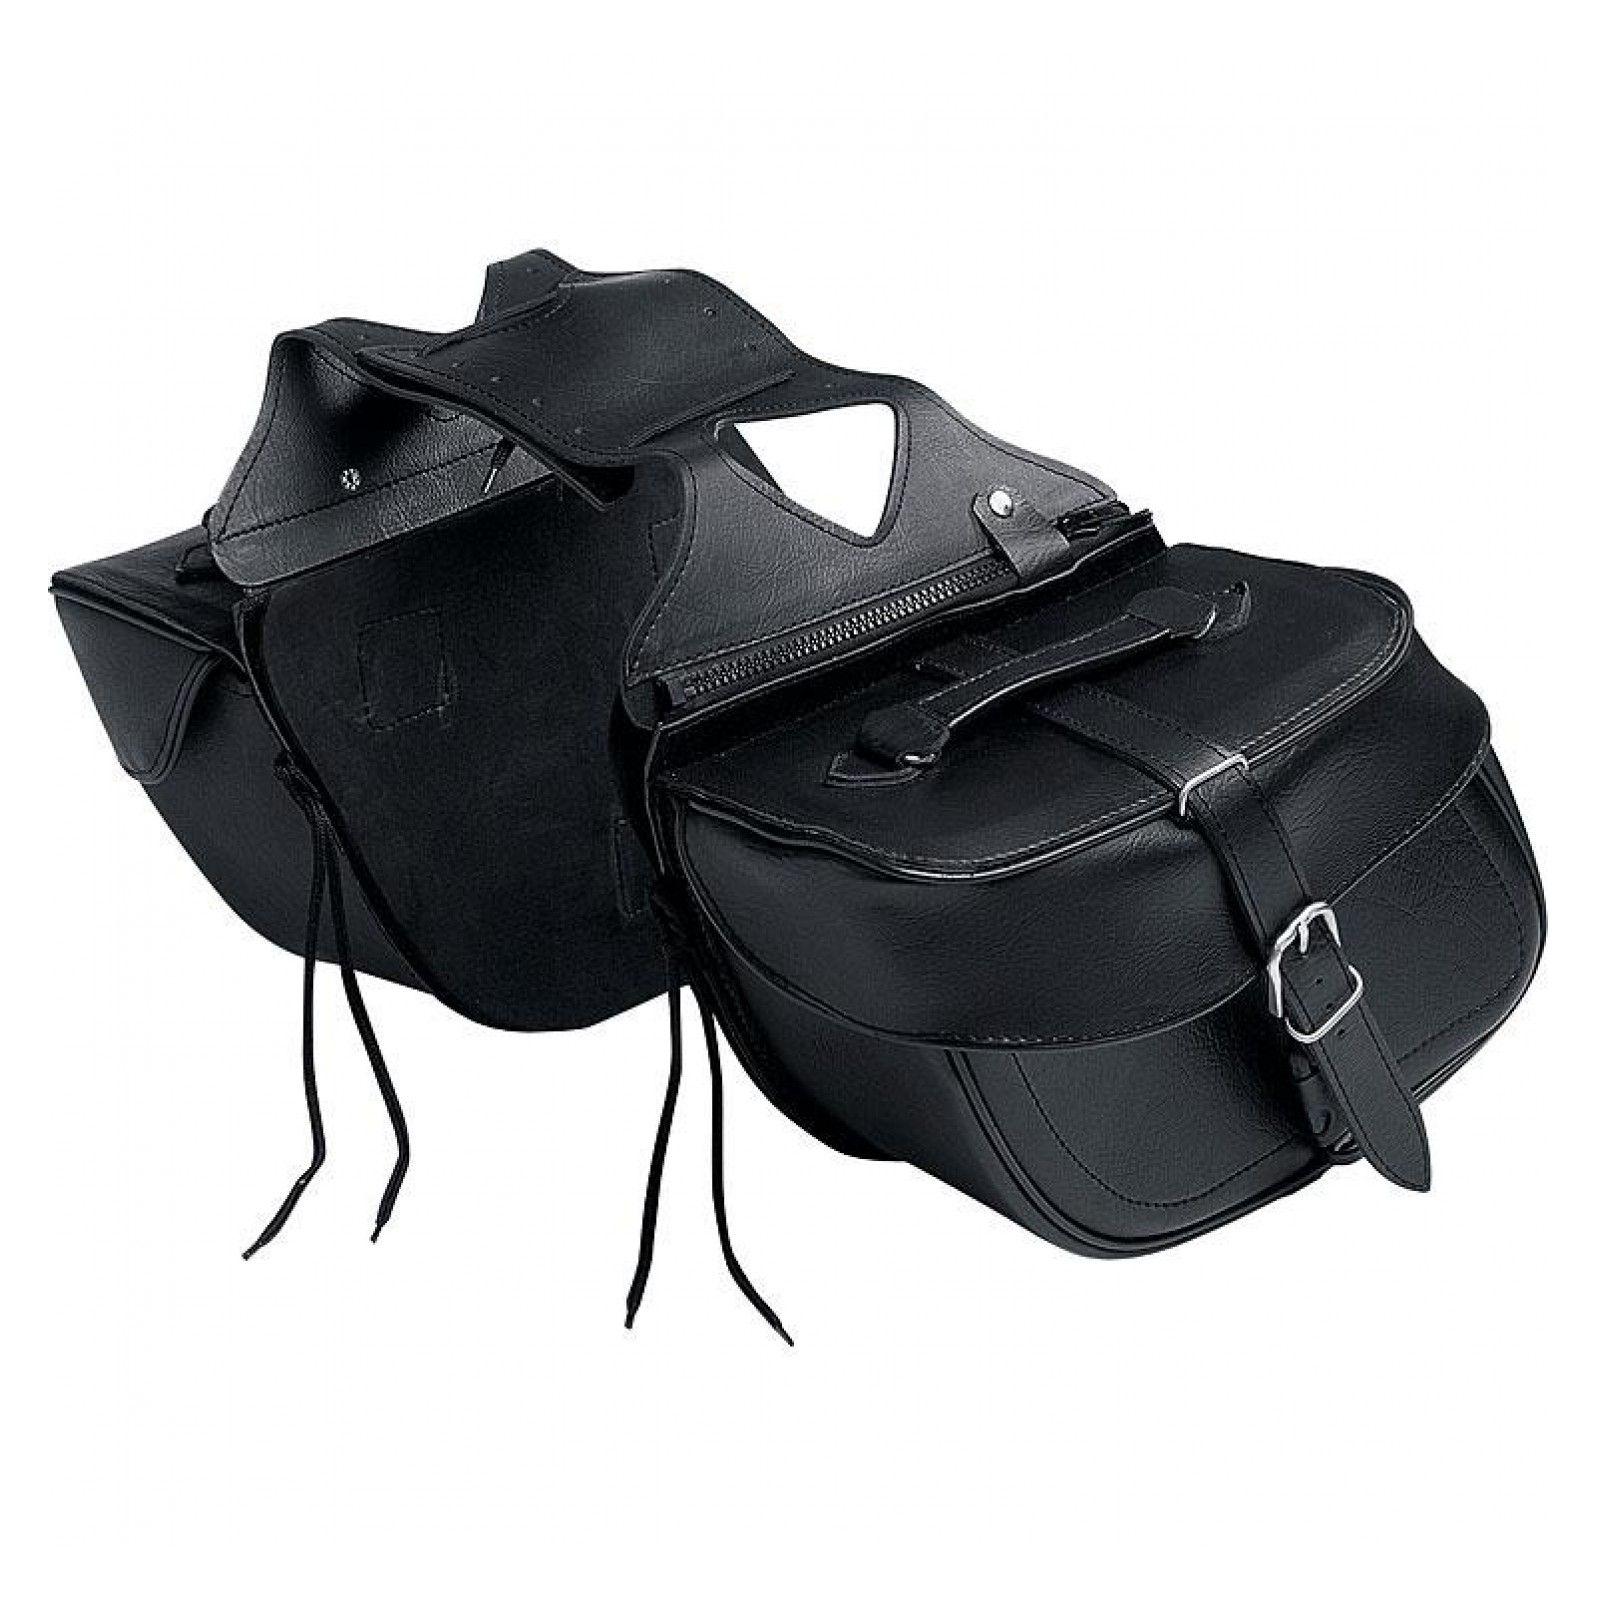 Sacoches cavalières Q Bag Saddle bag 08